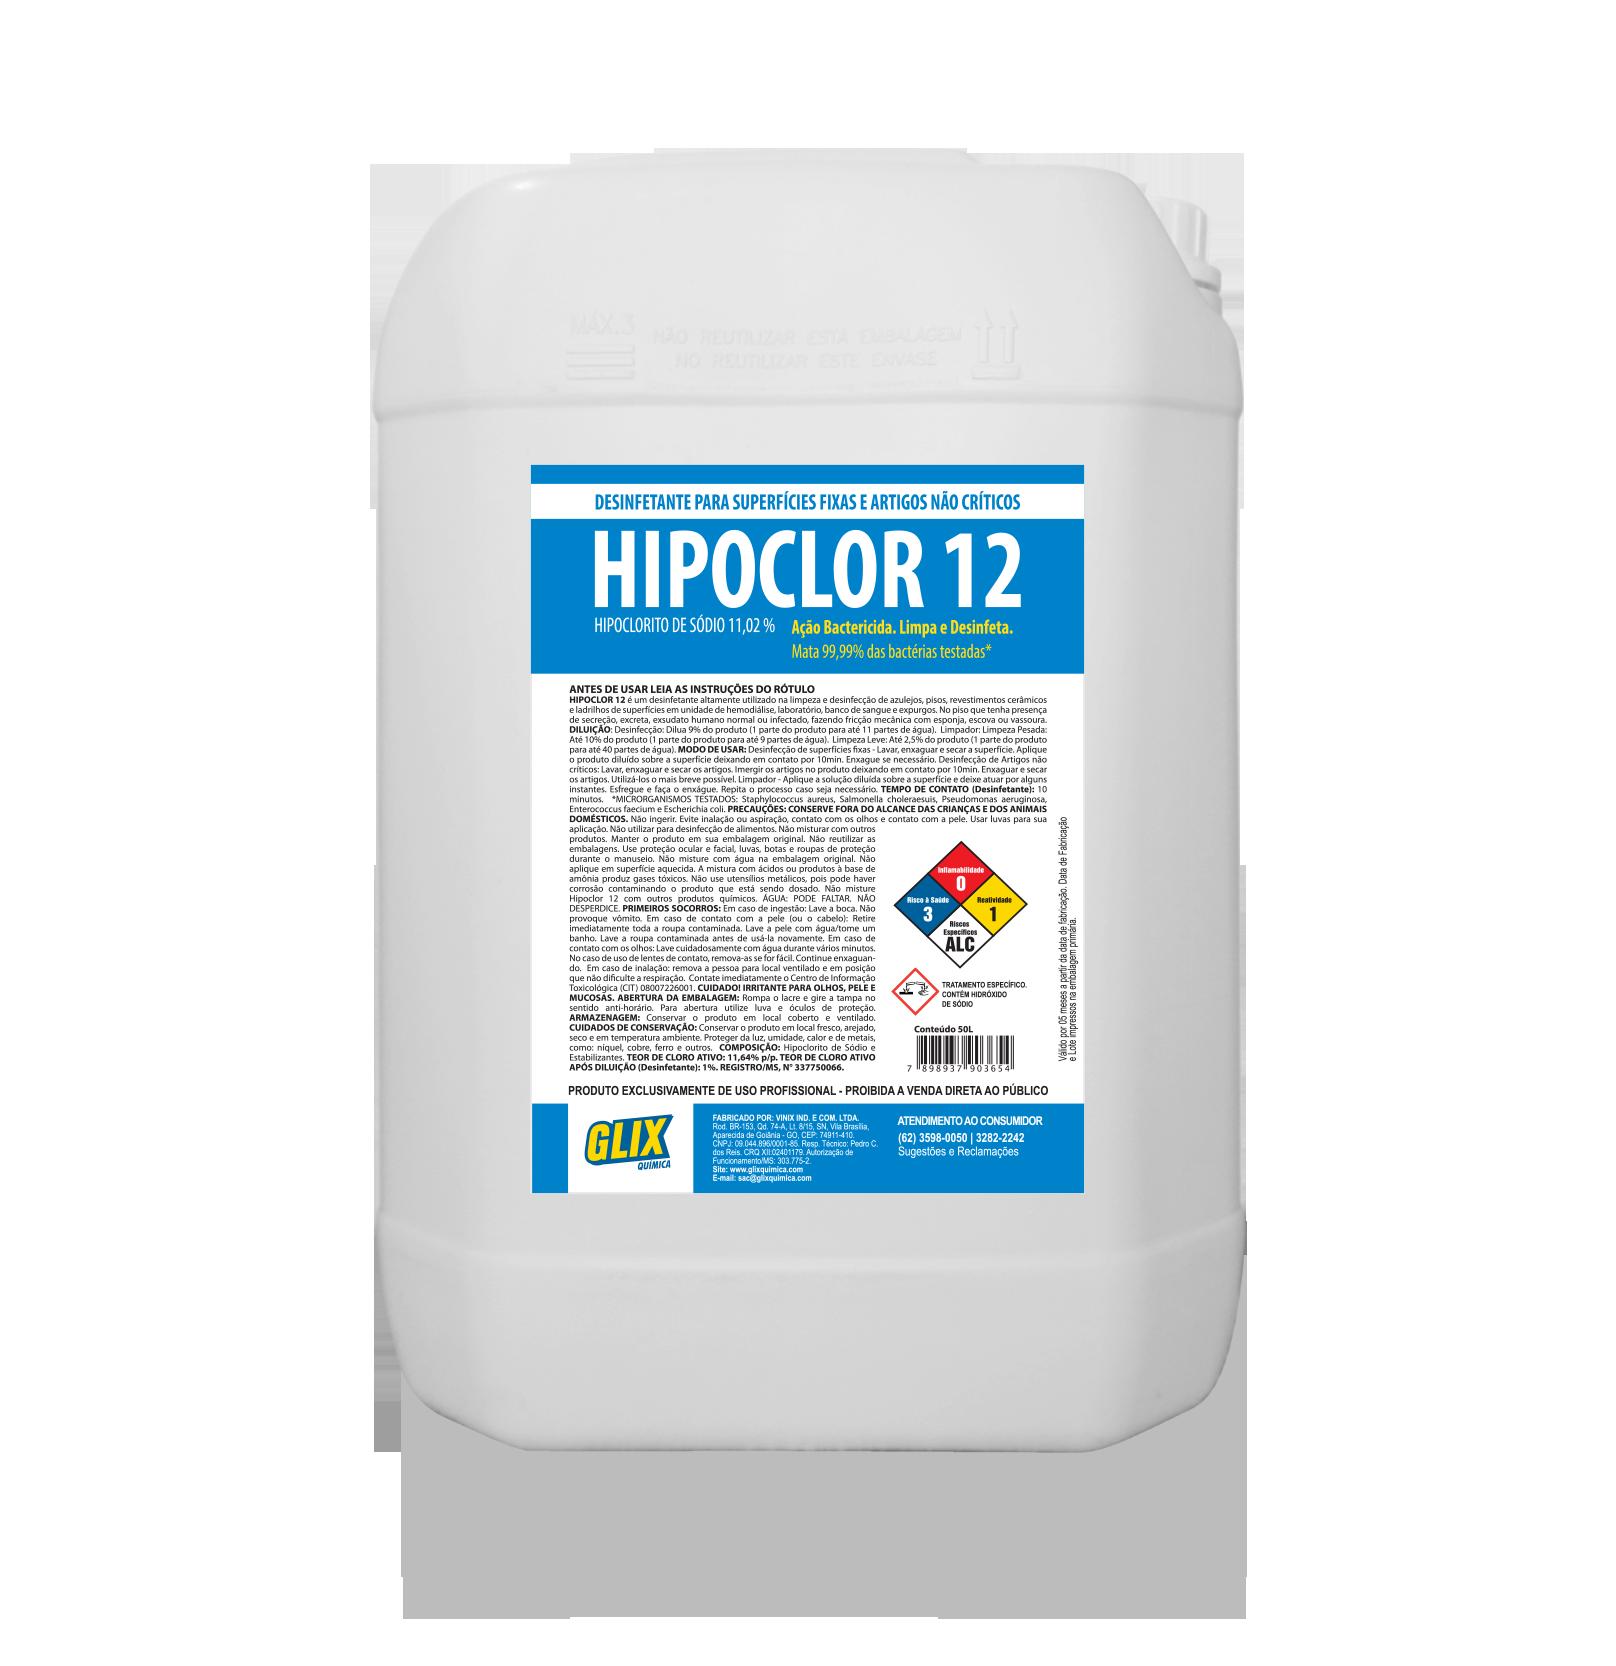 HIPOCLOR 12